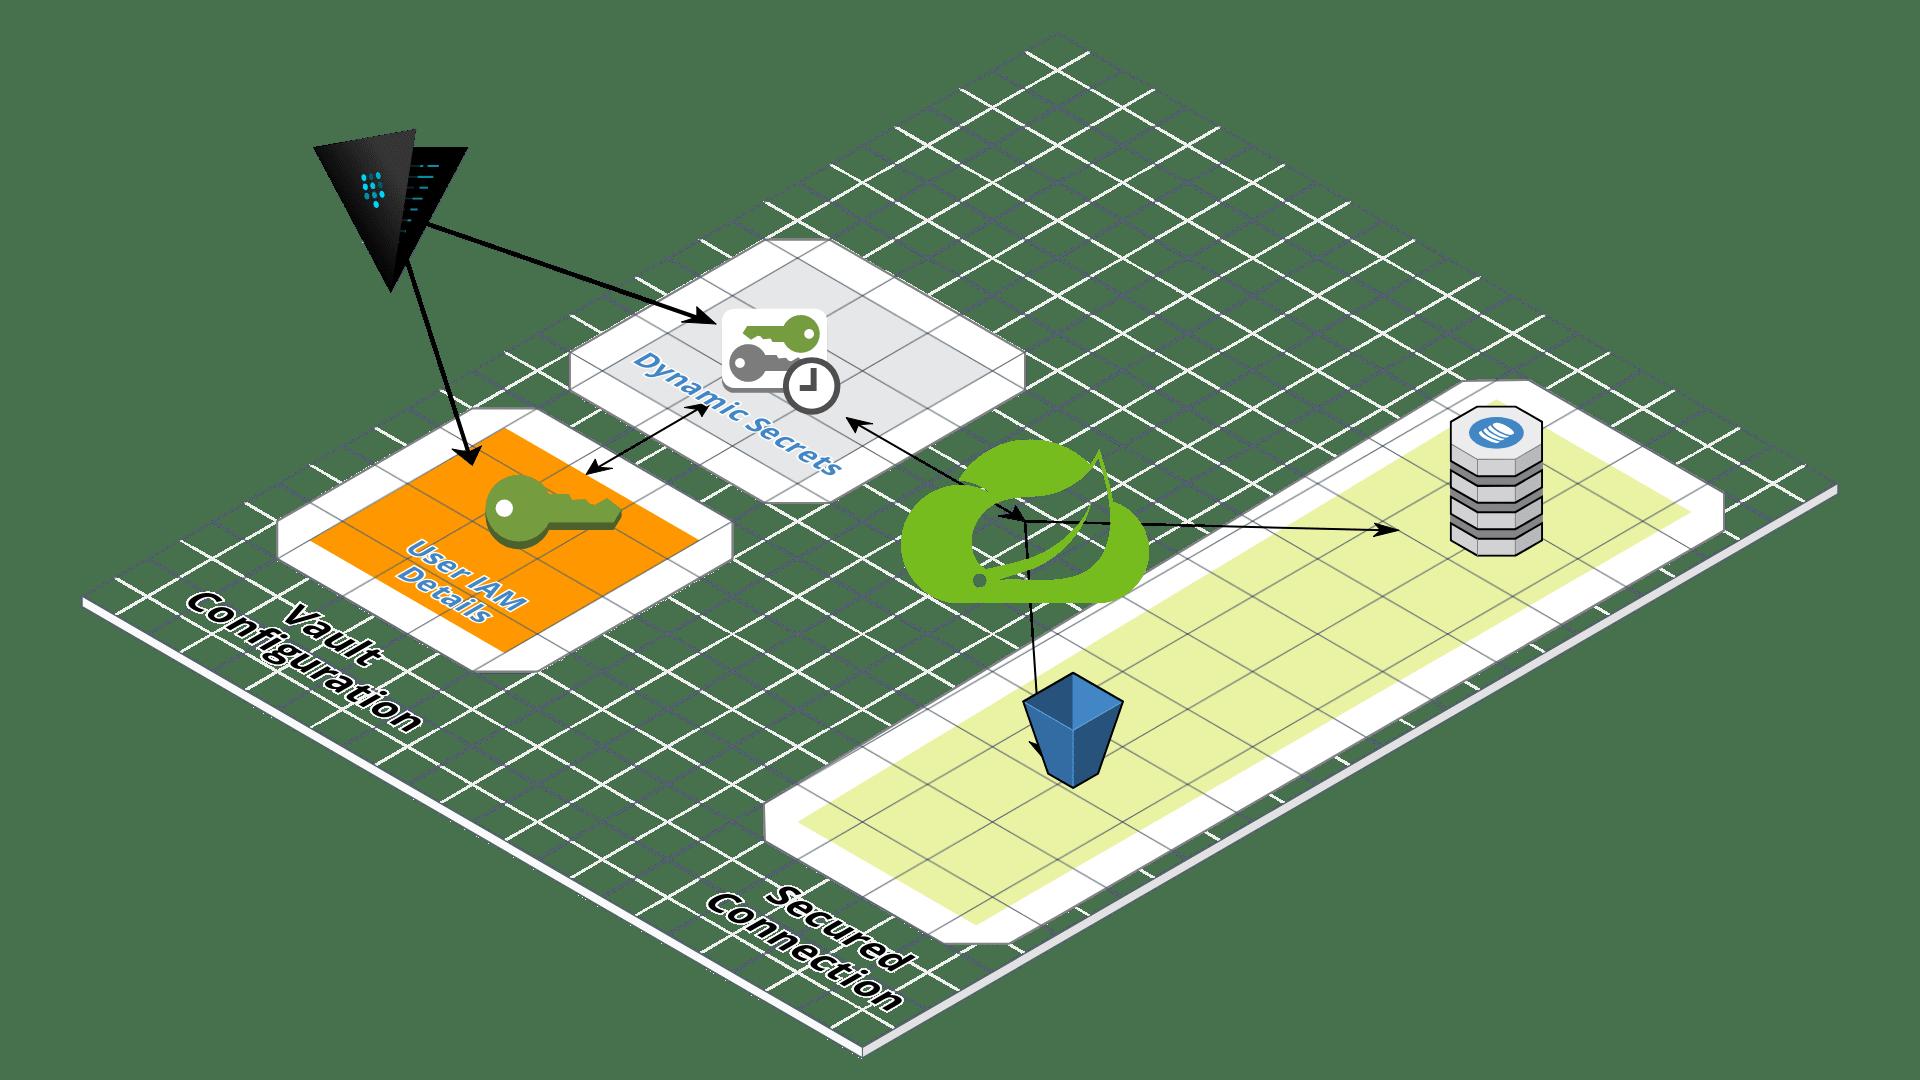 Secrets Management: Using Vault for Accessing the Cloud